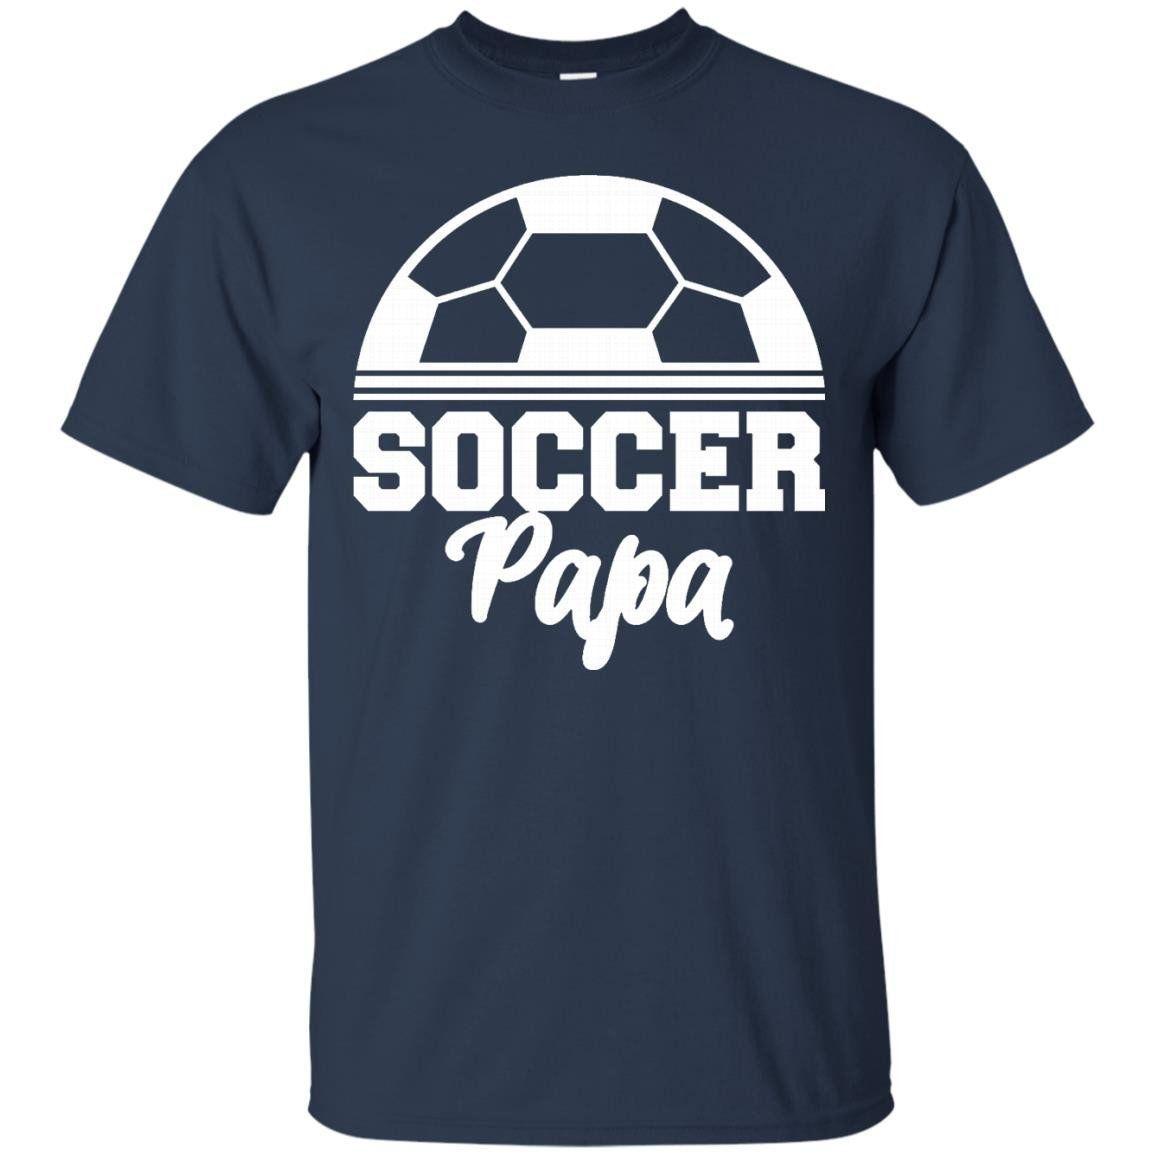 Soccer Papa T Shirt Soccer Lover T Shirt